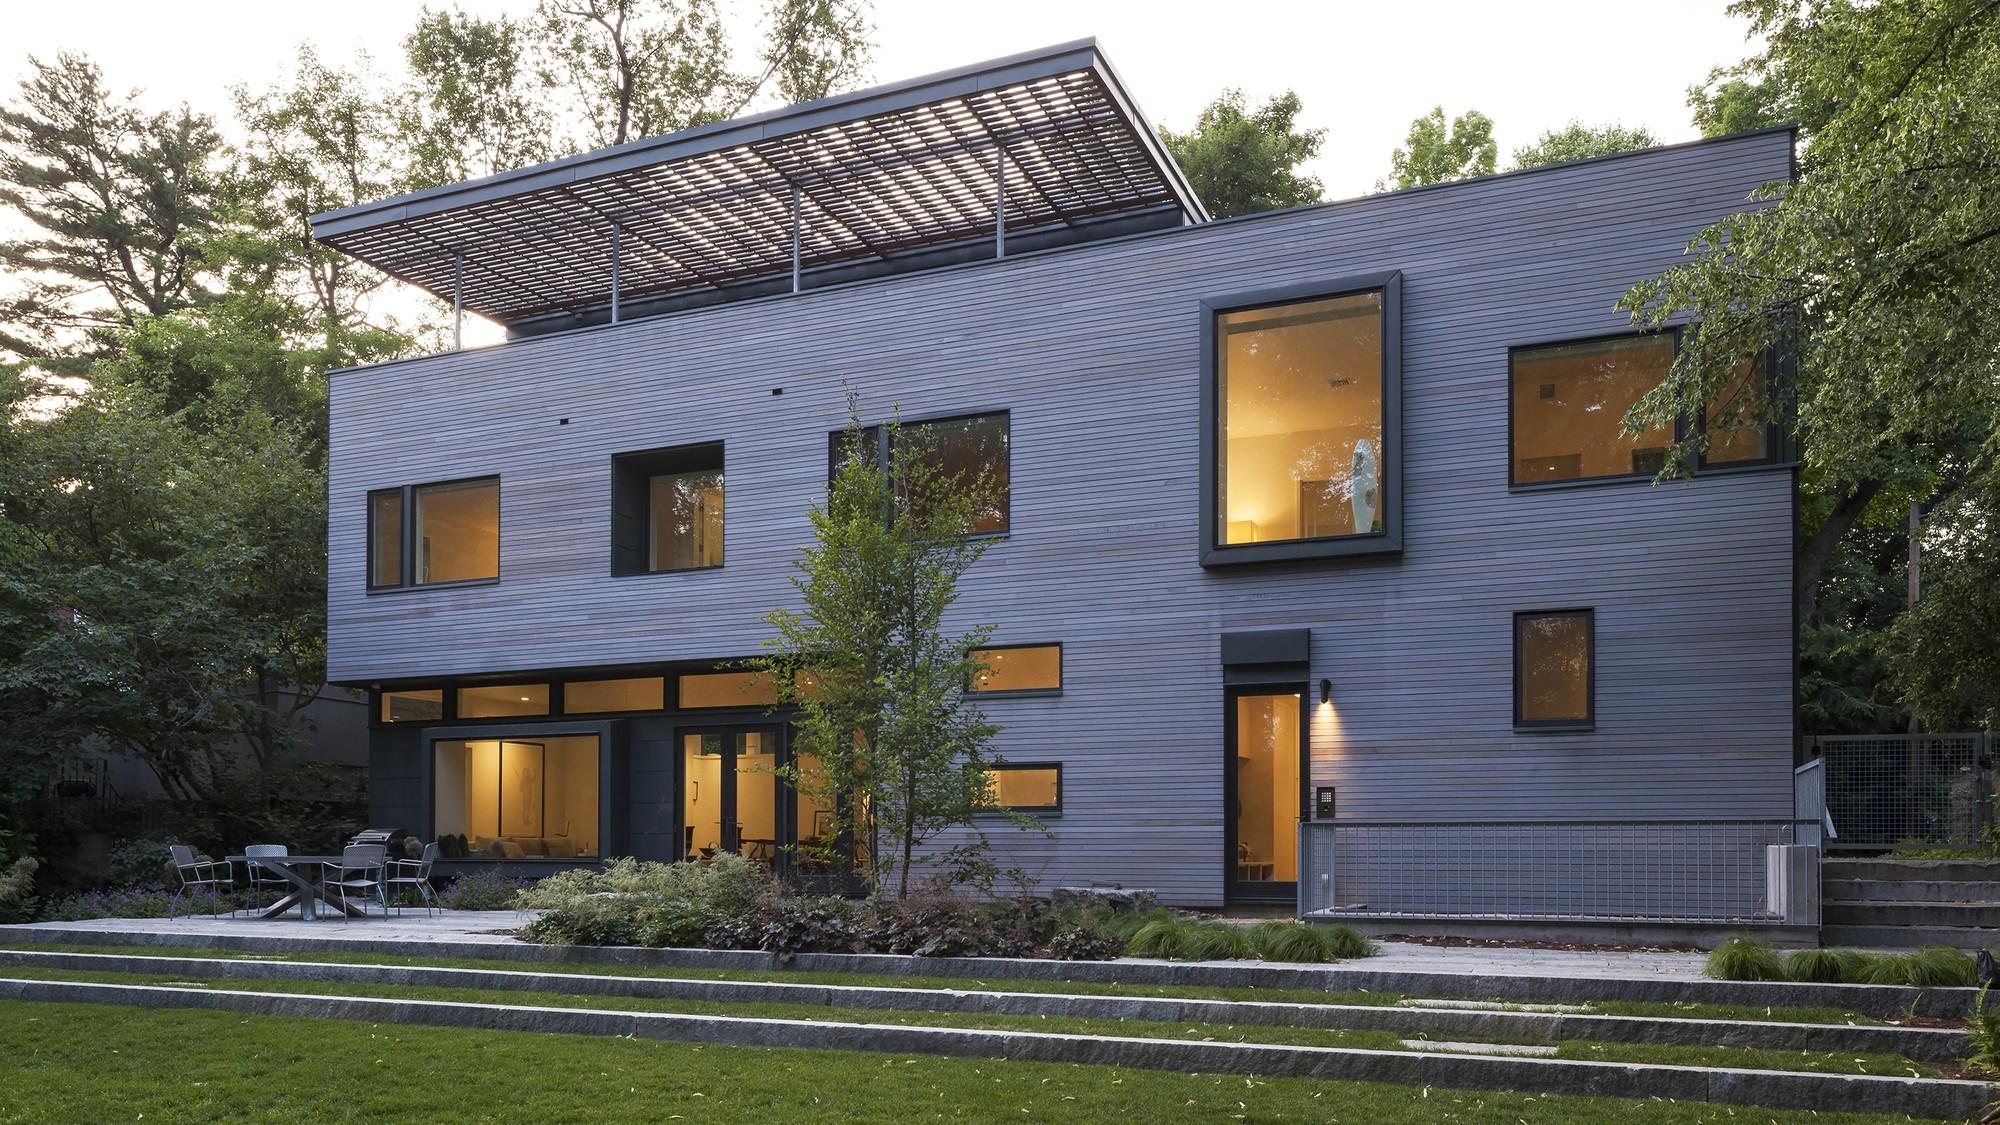 Galeria de casa cambridge anmahian winton architects 2 for Cool house plans com